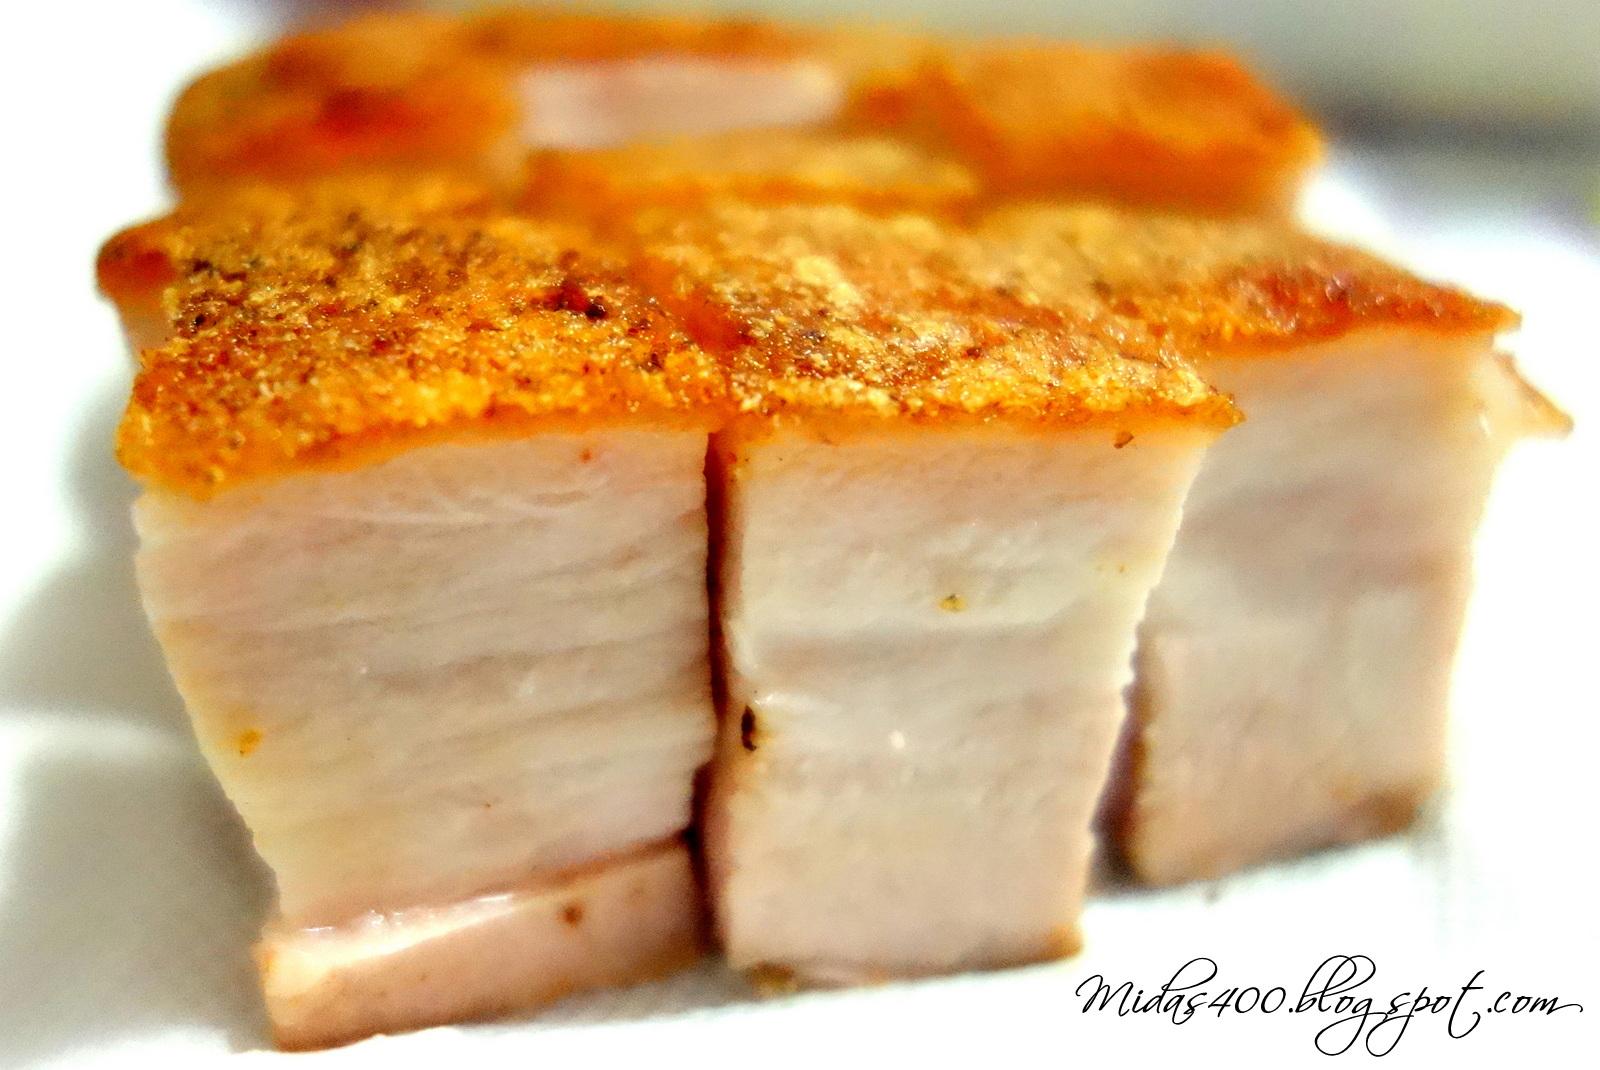 Crackling pork fat rules